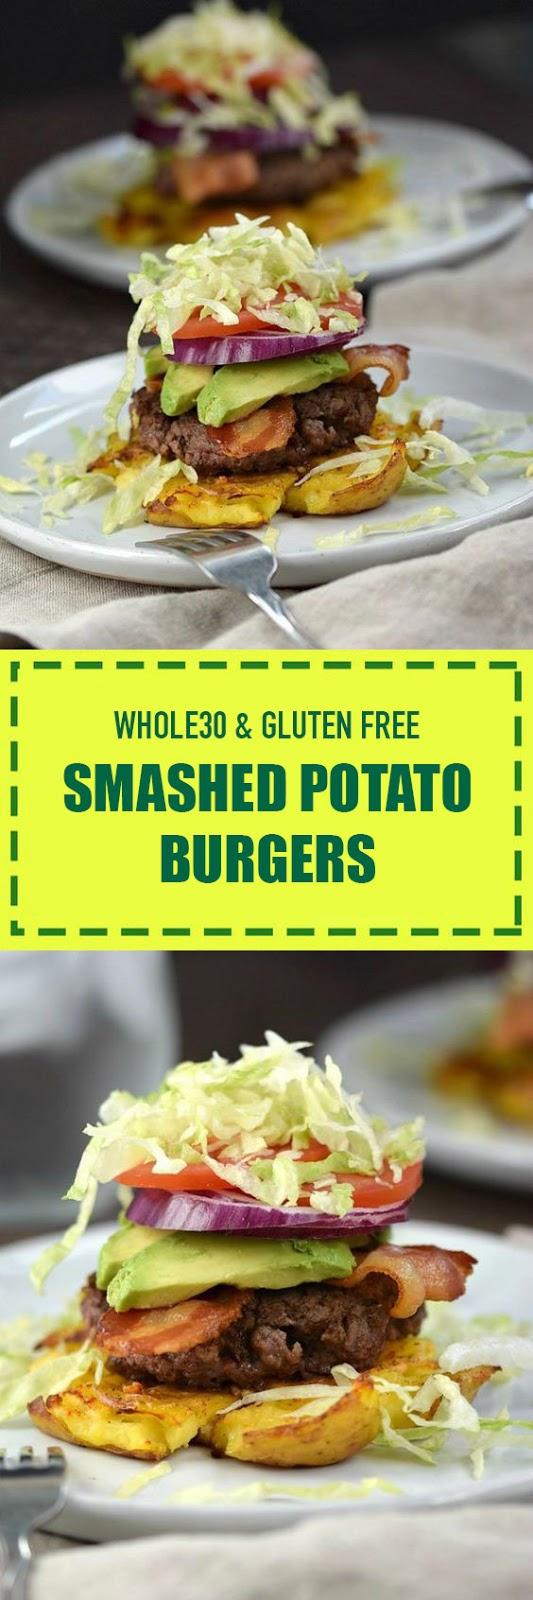 Whole30 & Gluten Free Smashed Potato Burgers